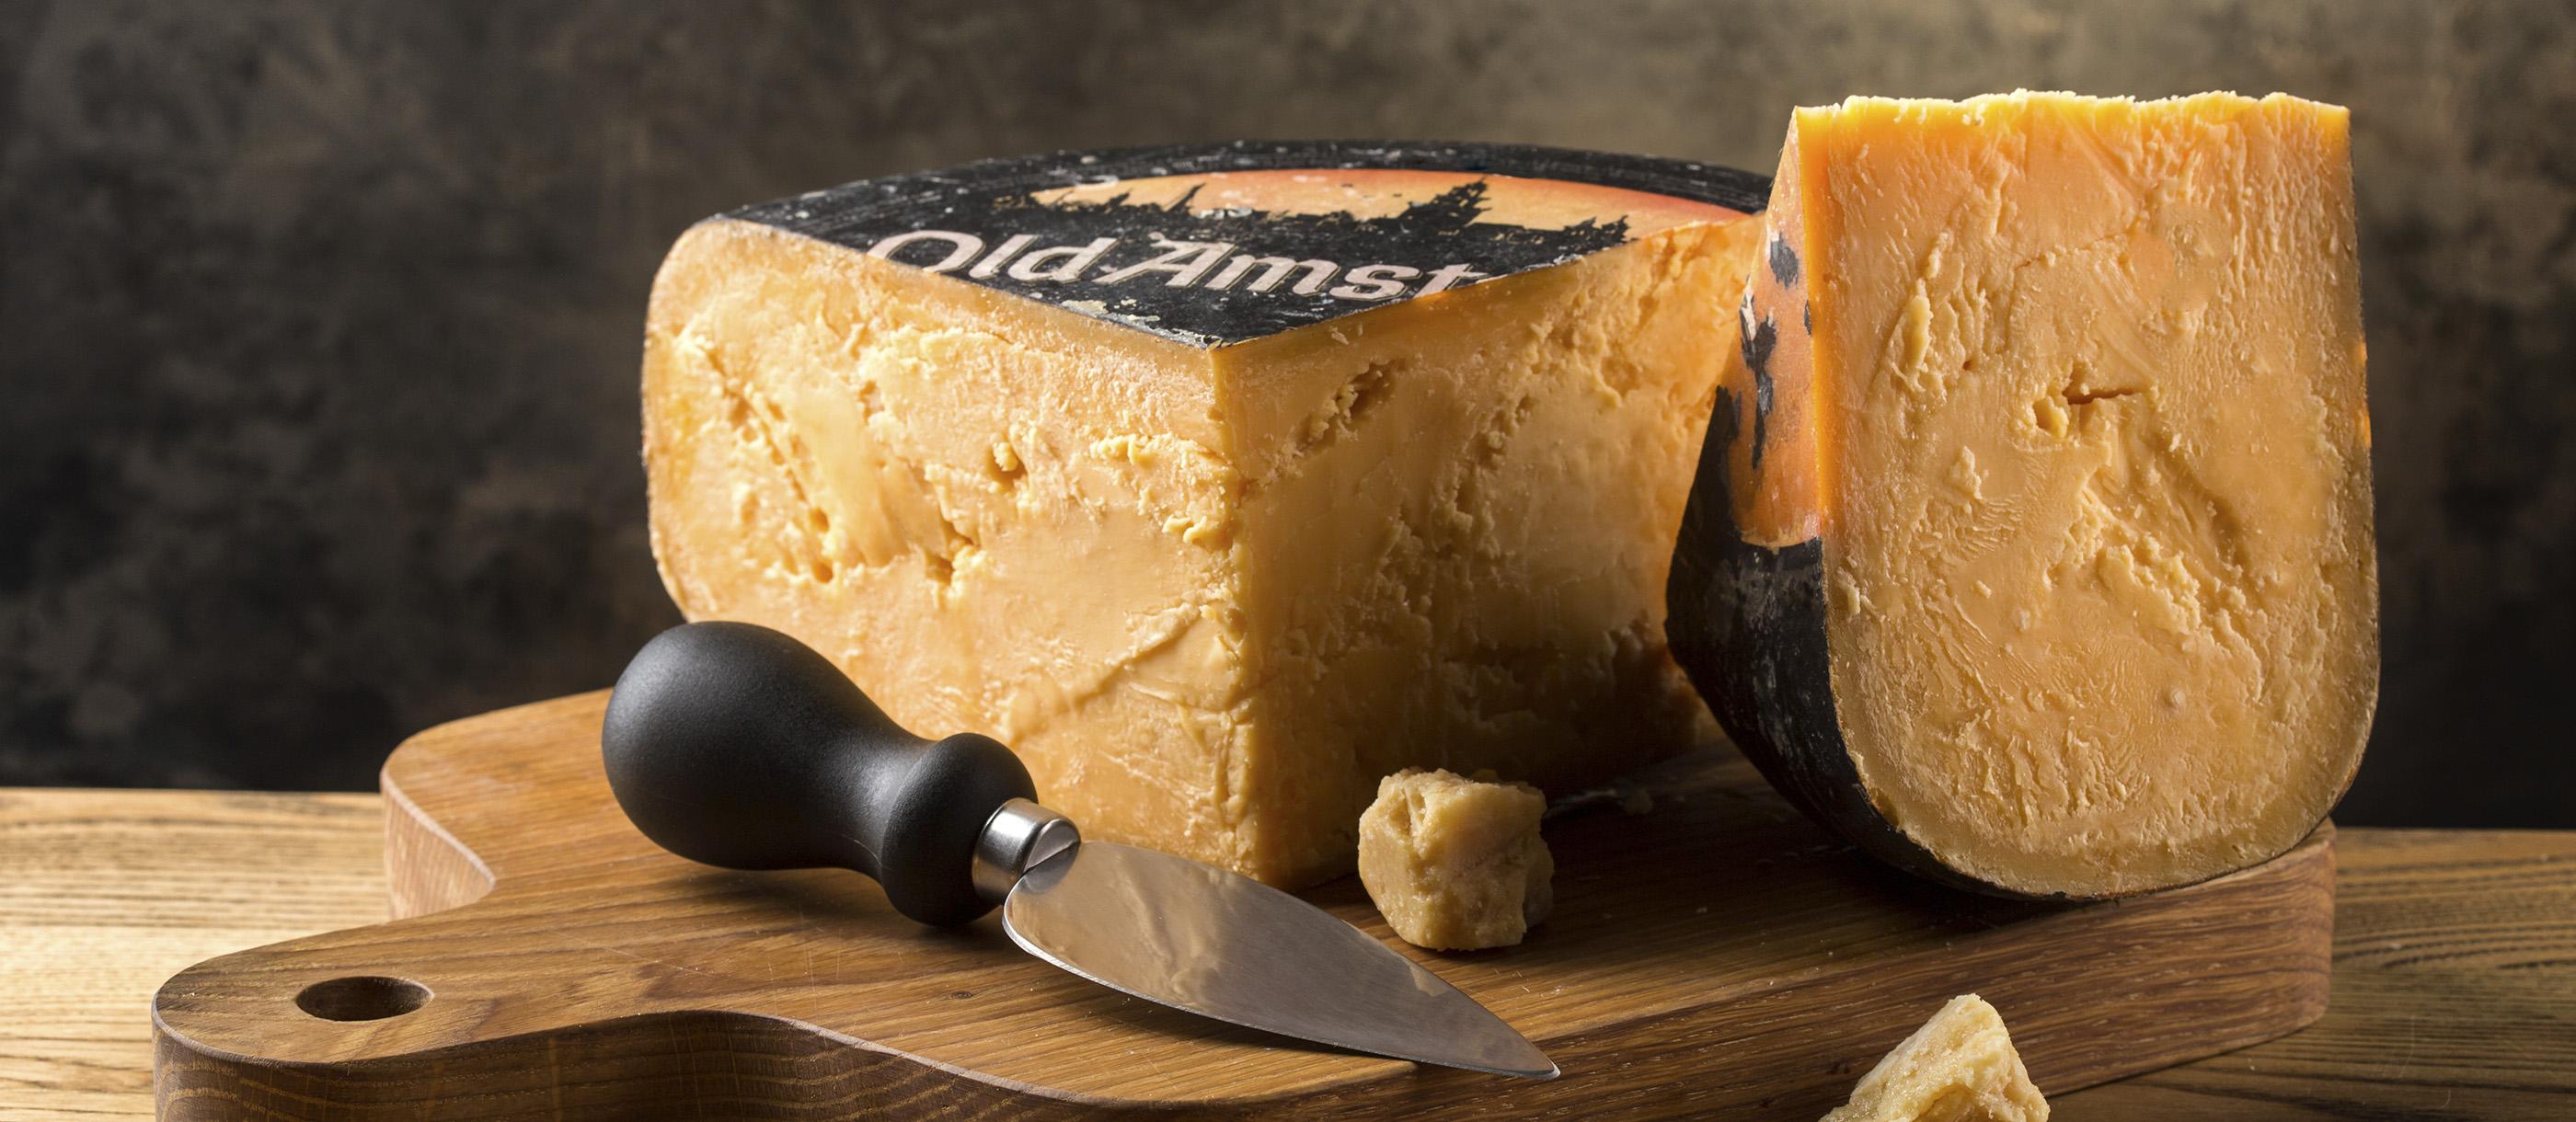 10 Most Popular Dutch Cheeses - TasteAtlas